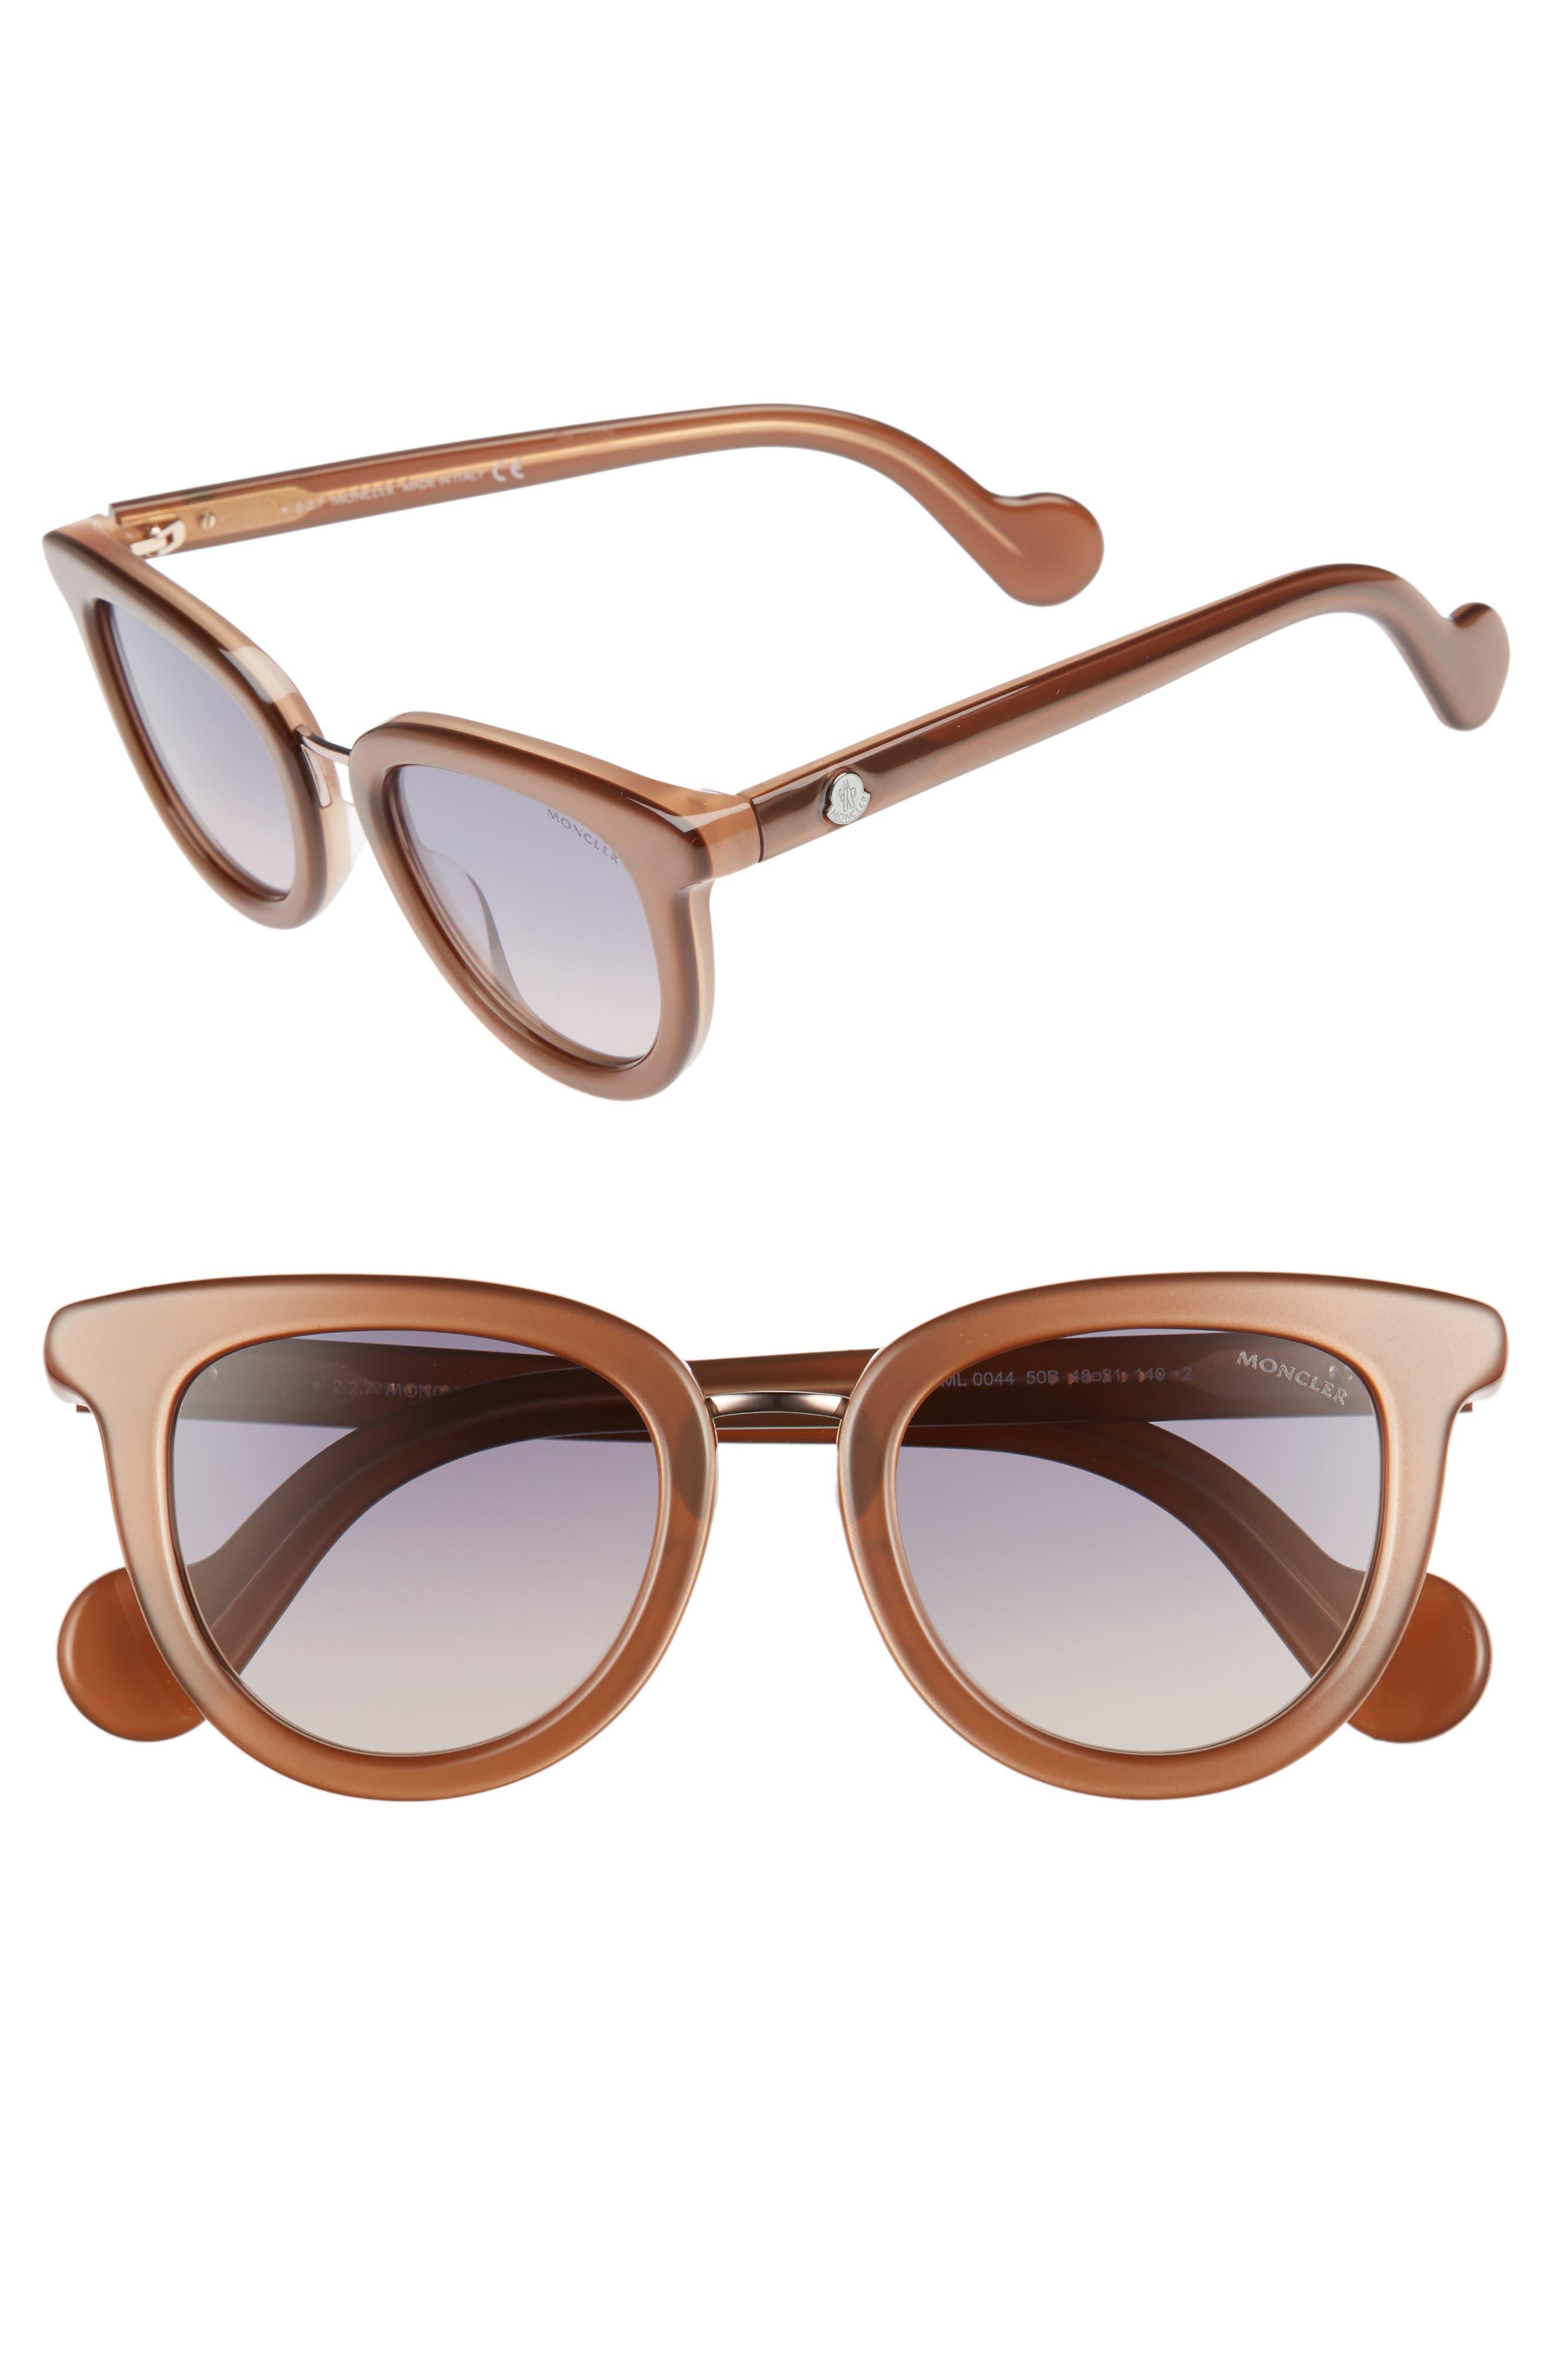 MONCLER, 48mm Cat Eye Sunglasses, Main thumbnail 1, color, PEARL BROWN/ GREY/ SAND